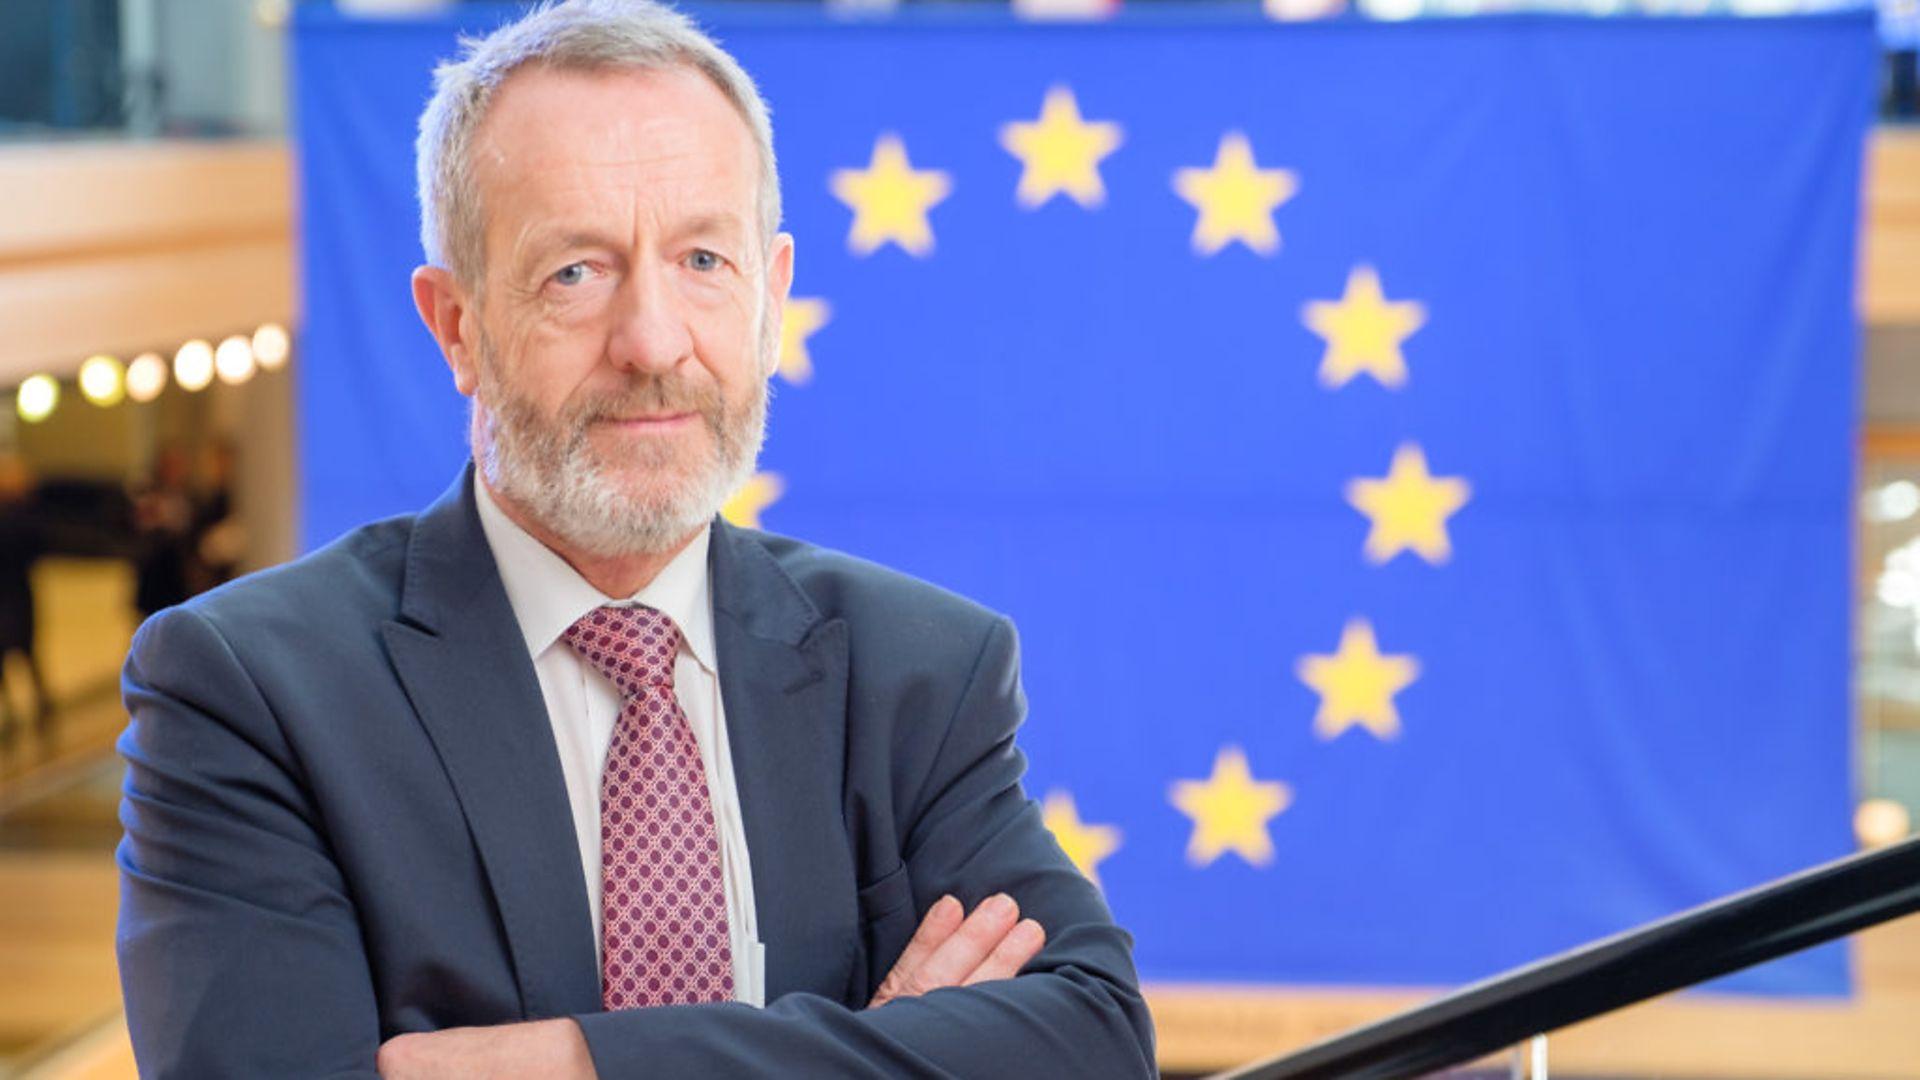 Seán Kelly is an EPP MEP in the European Parliament - Credit: Seán Kelly